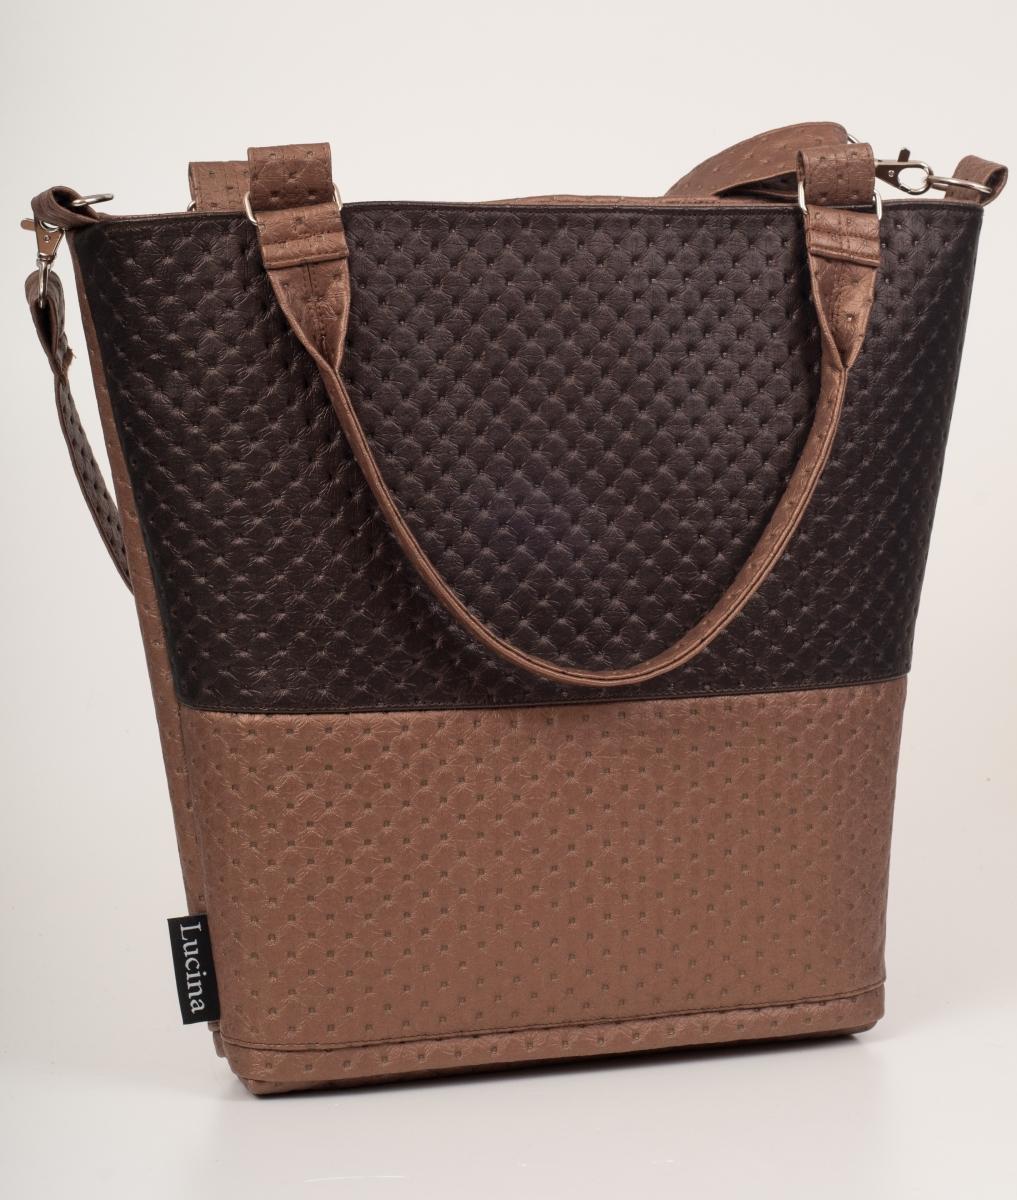 16718729a8 Dámská kabelka LUCINA Lux brown 1